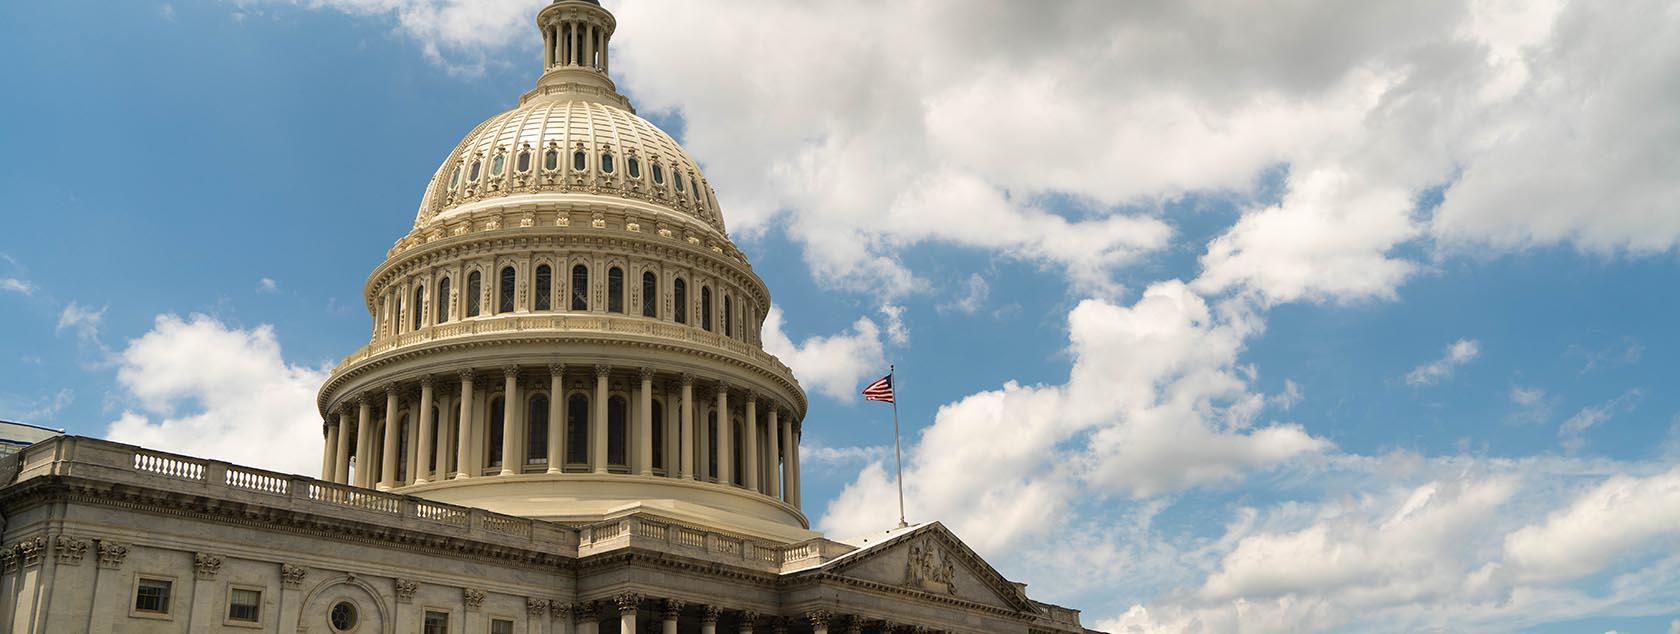 united-states-capitol-building